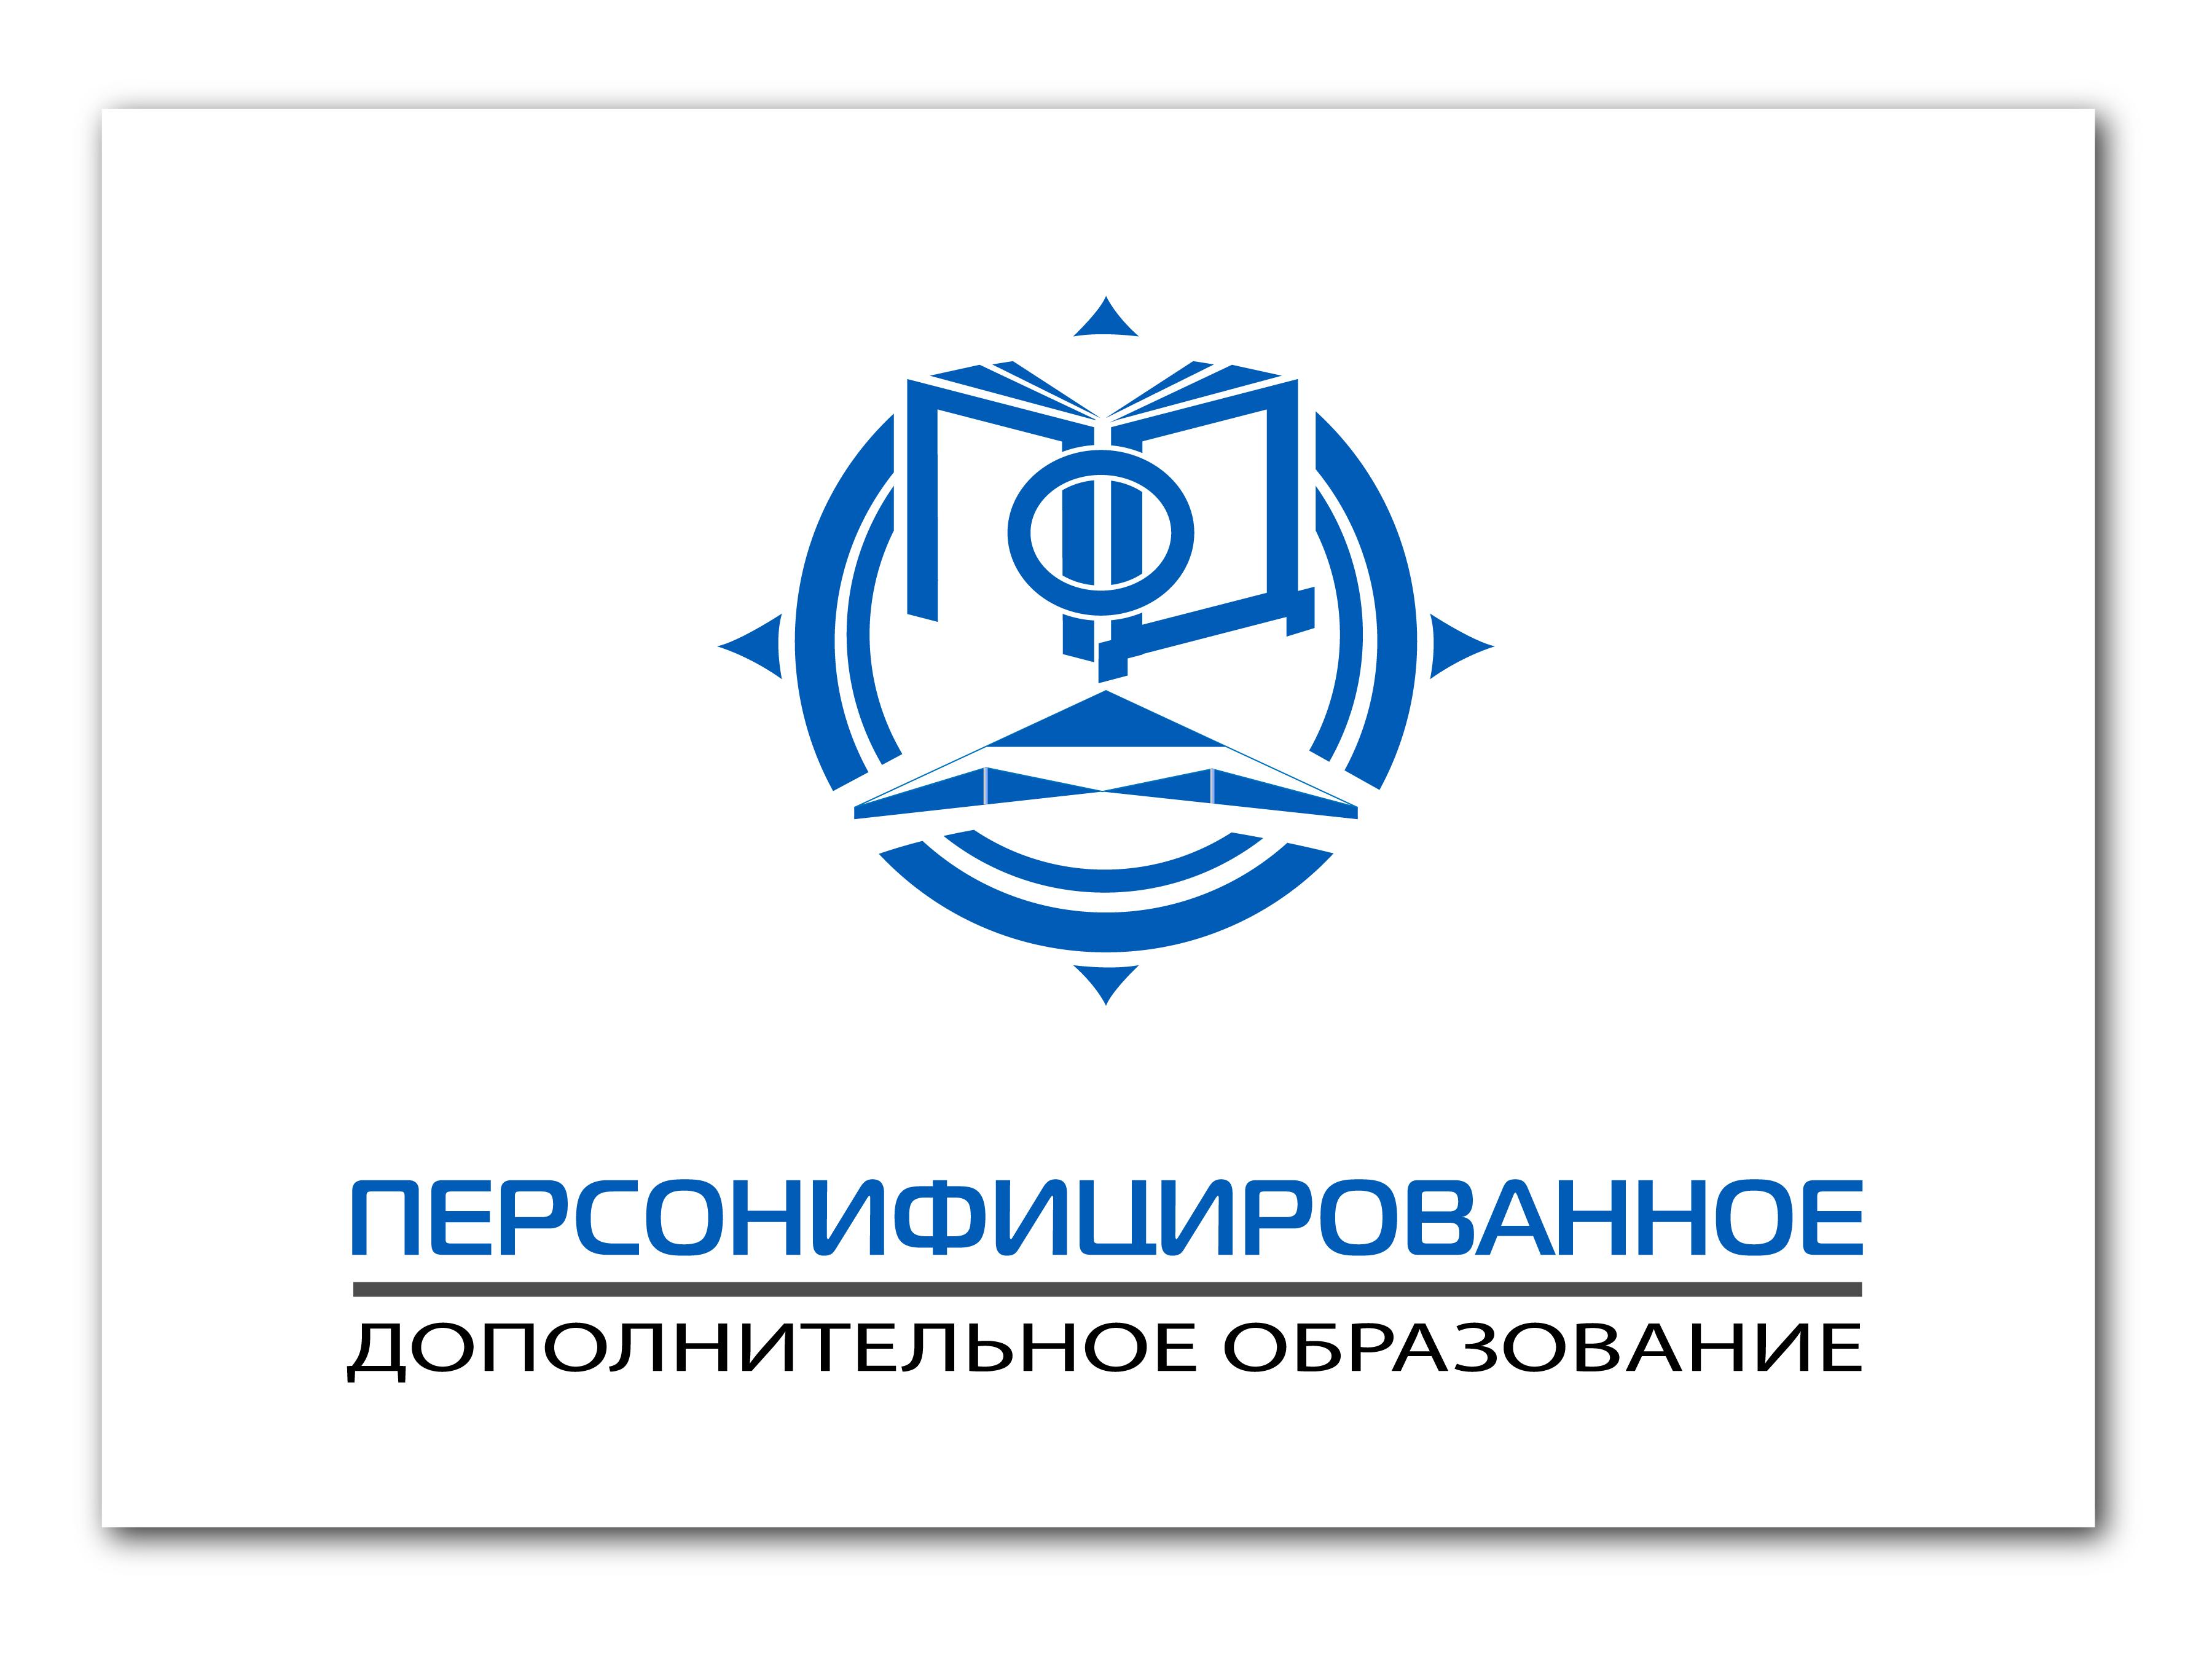 Логотип для интернет-портала фото f_7335a5e675663112.jpg